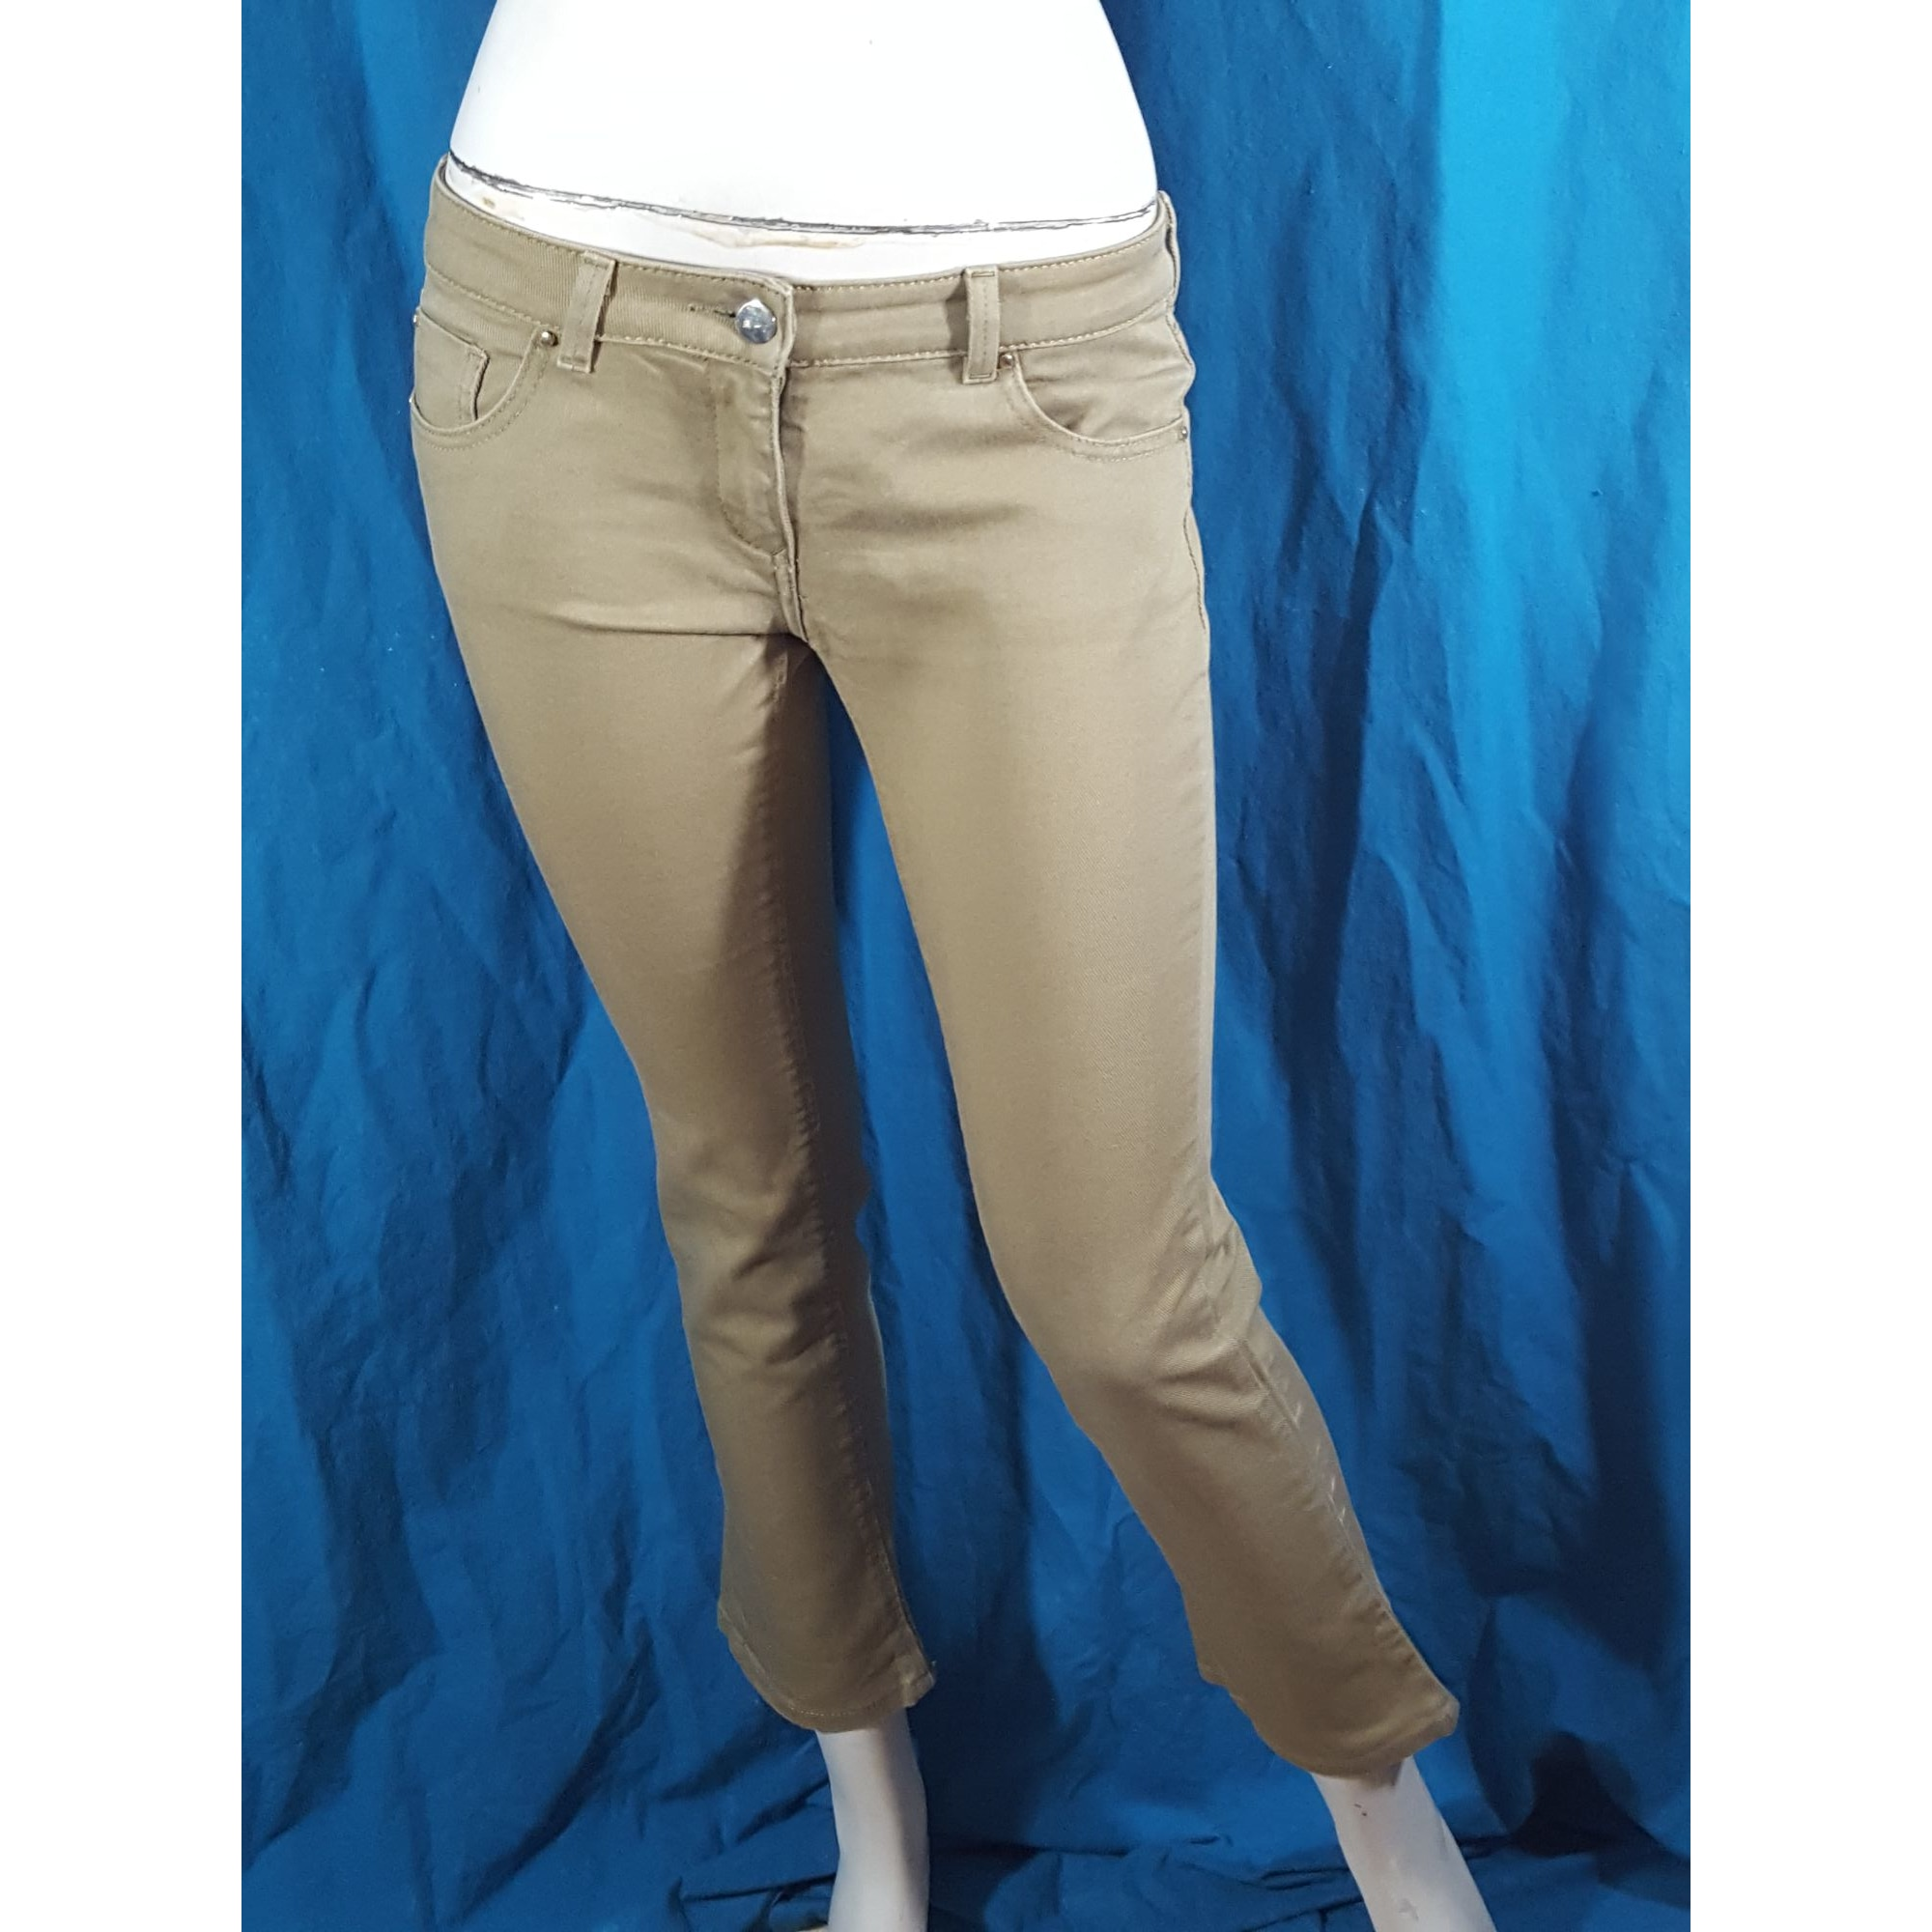 Jeans droit BARBARA BUI Beige, camel